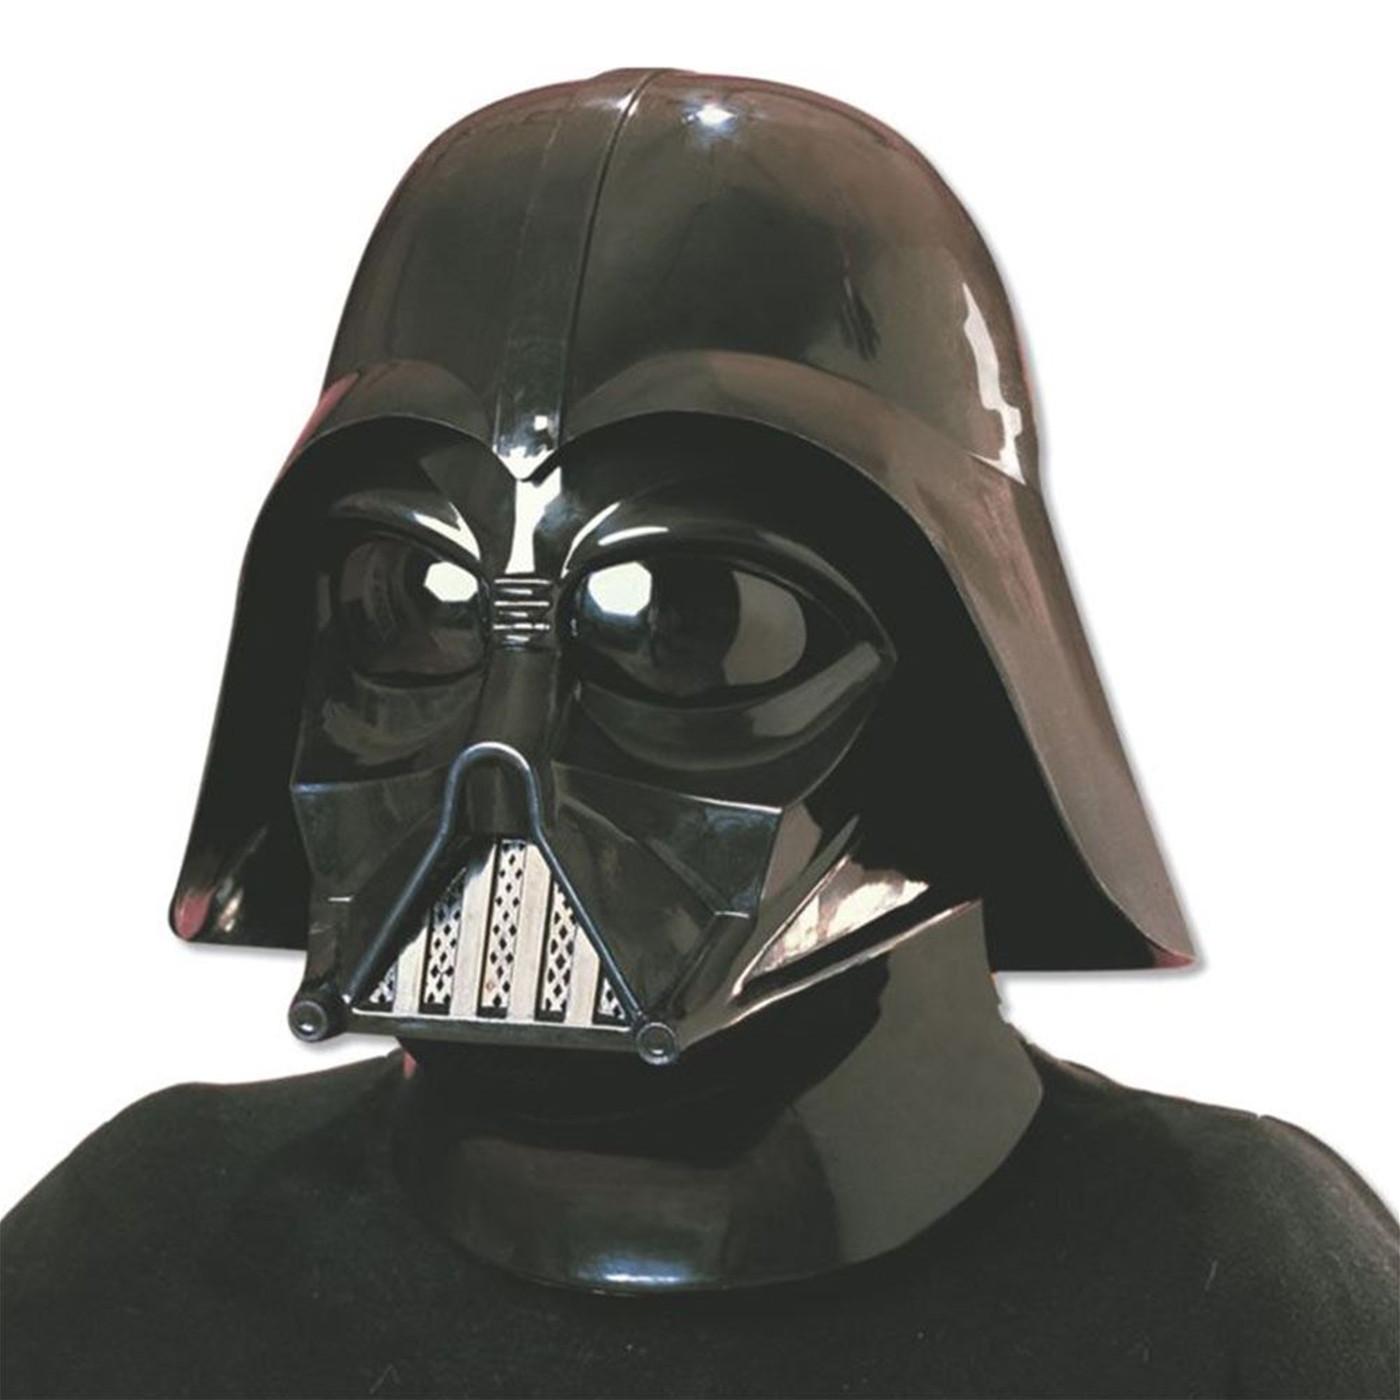 Star Wars Darth Vader 2-Piece Mask